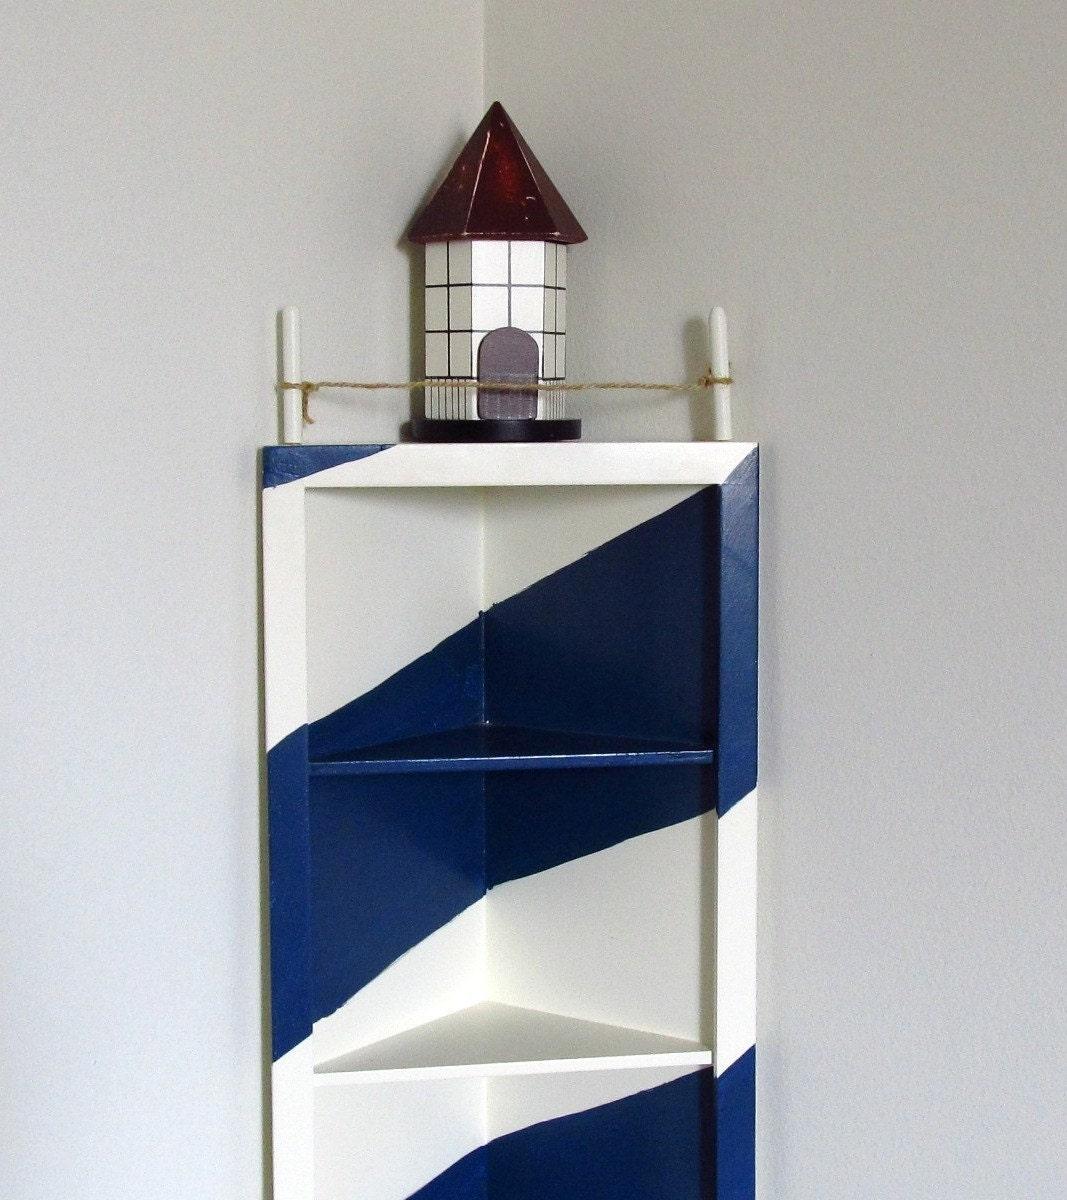 Lighthouse Bedroom Decor Lighthouse Corner Shelf Nautical Decor Display Coupon Code